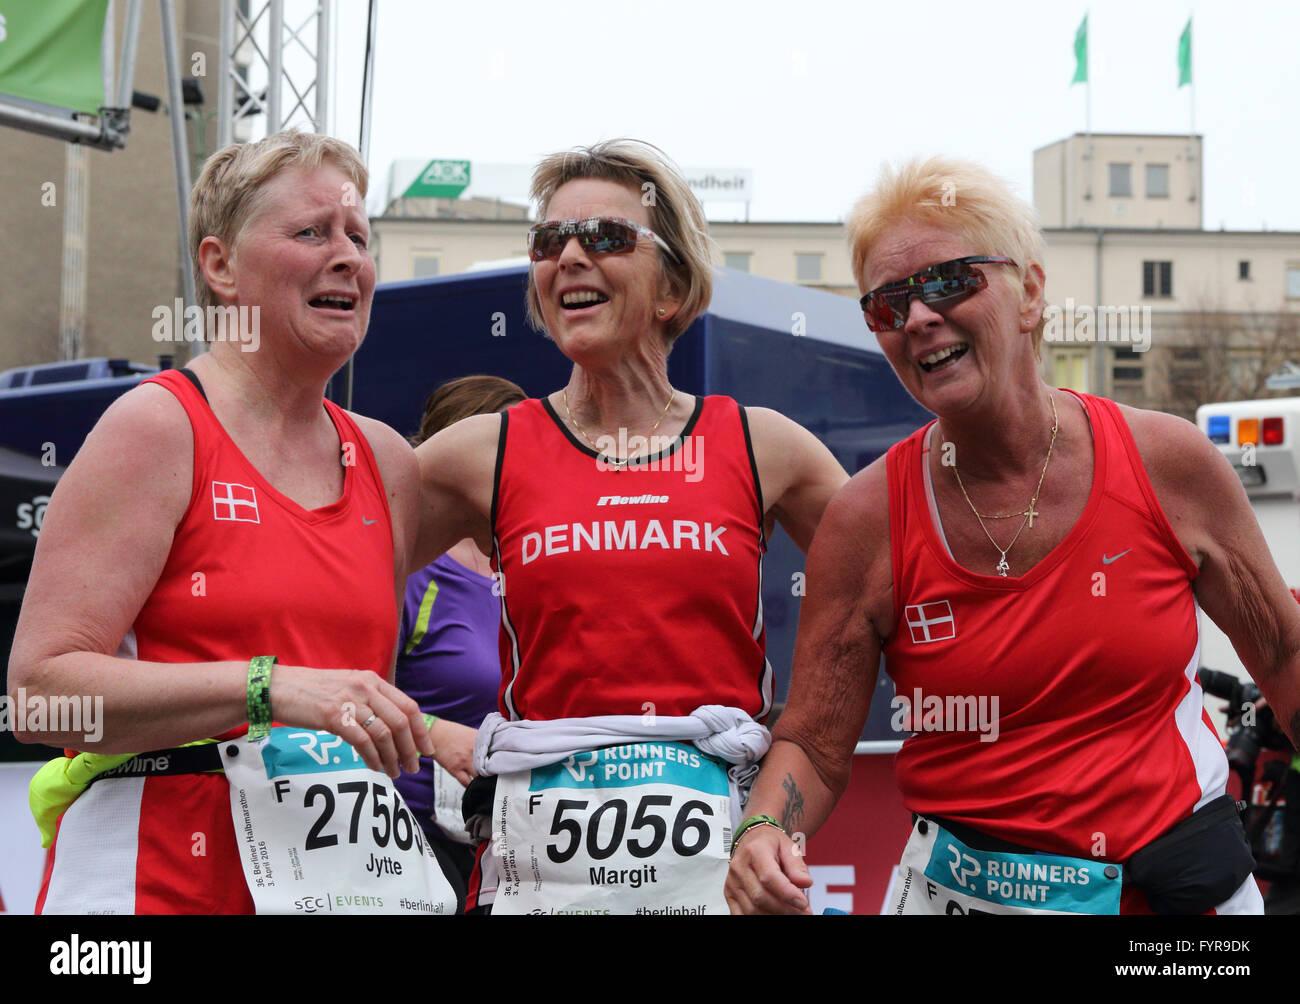 Three women from Denmark just after finishing the Berlin Half Marathon. - Stock Image